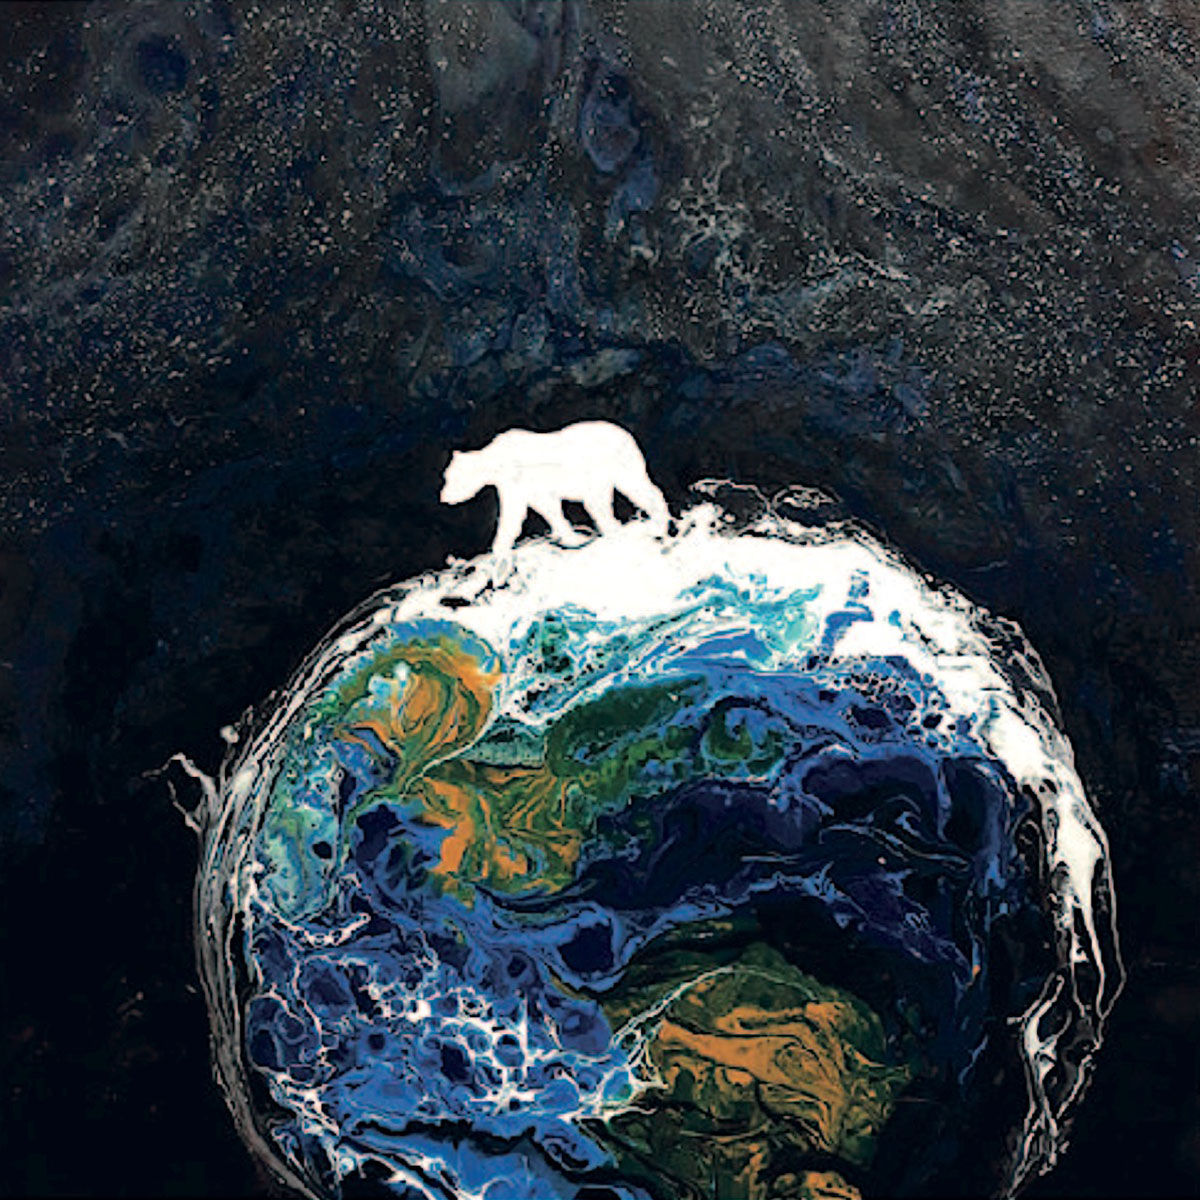 Extinction, 2019 by Lee Pey Huey (Jocelyn)